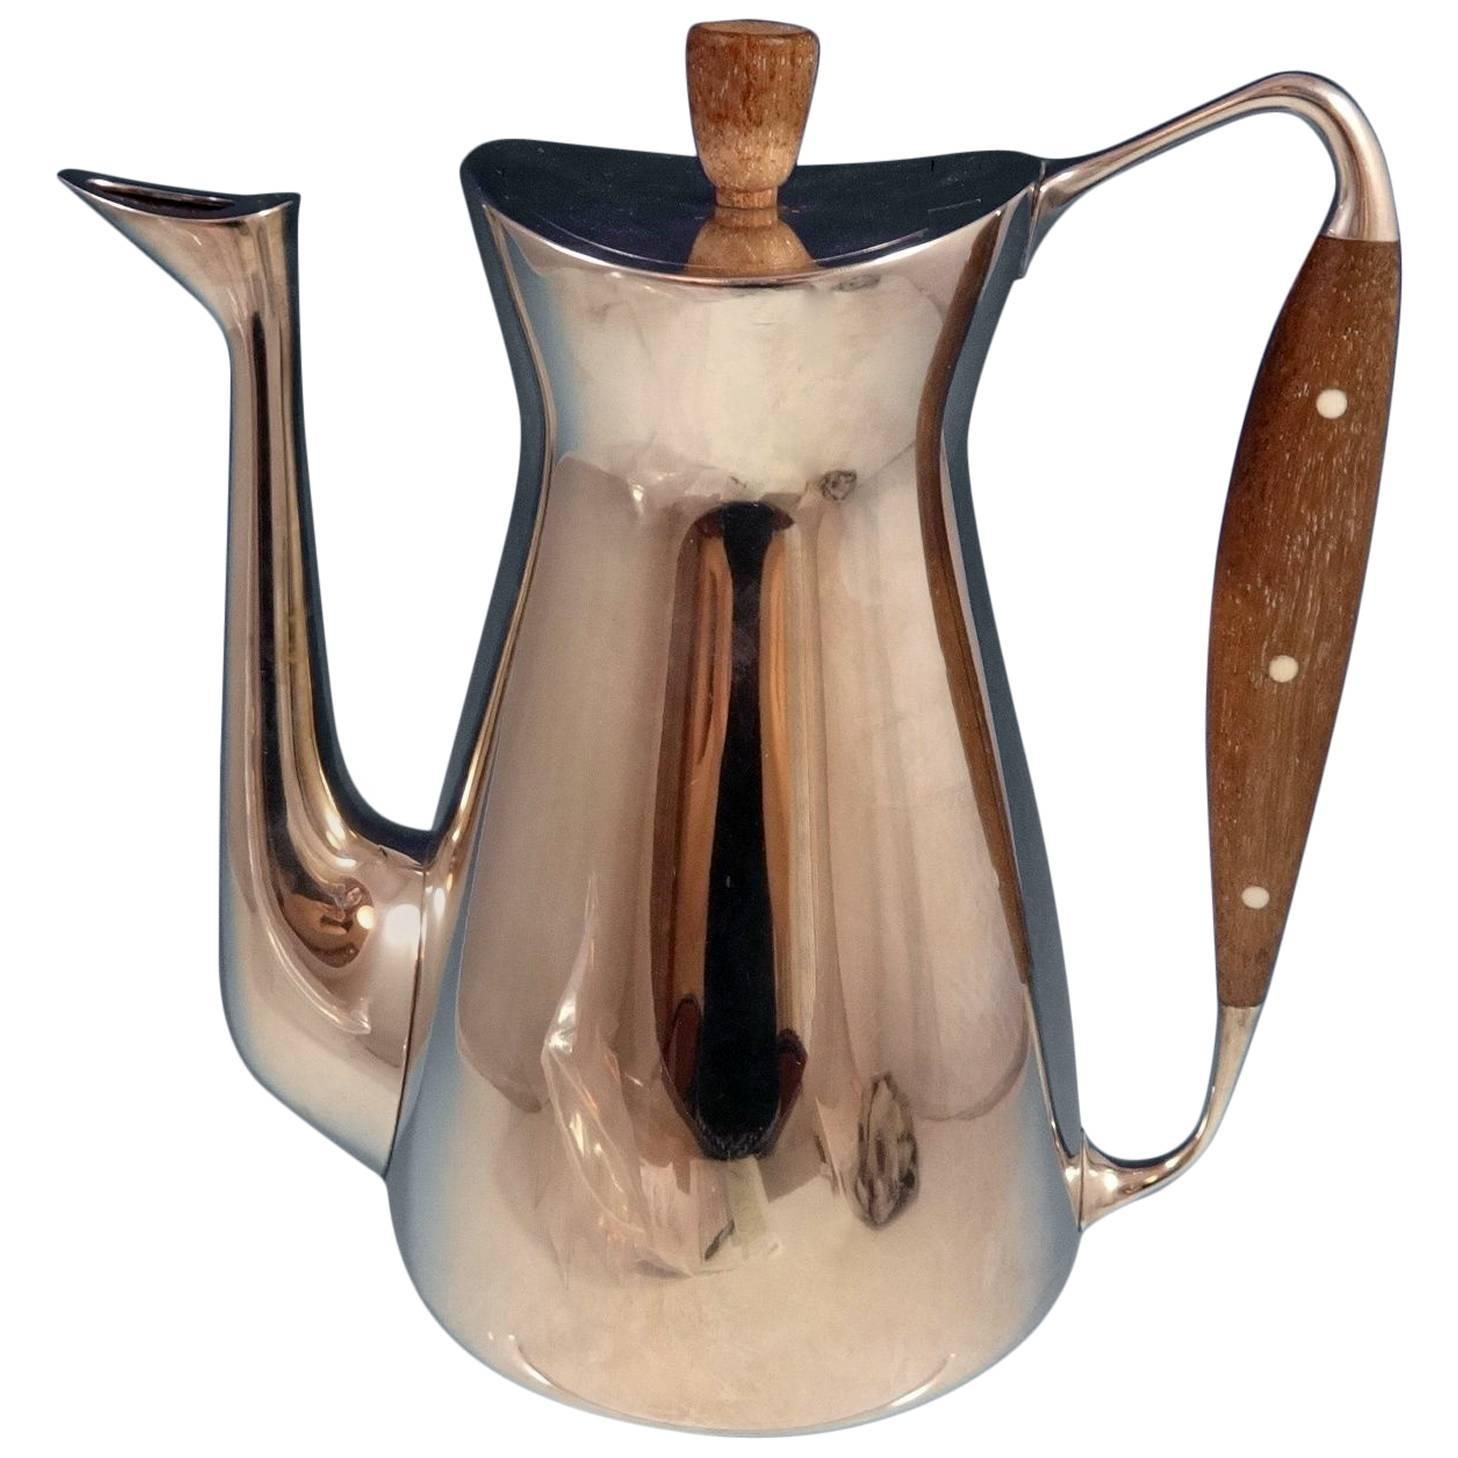 Michelsen Danish Sterling Silver Coffee Pot Modernism Hollowware